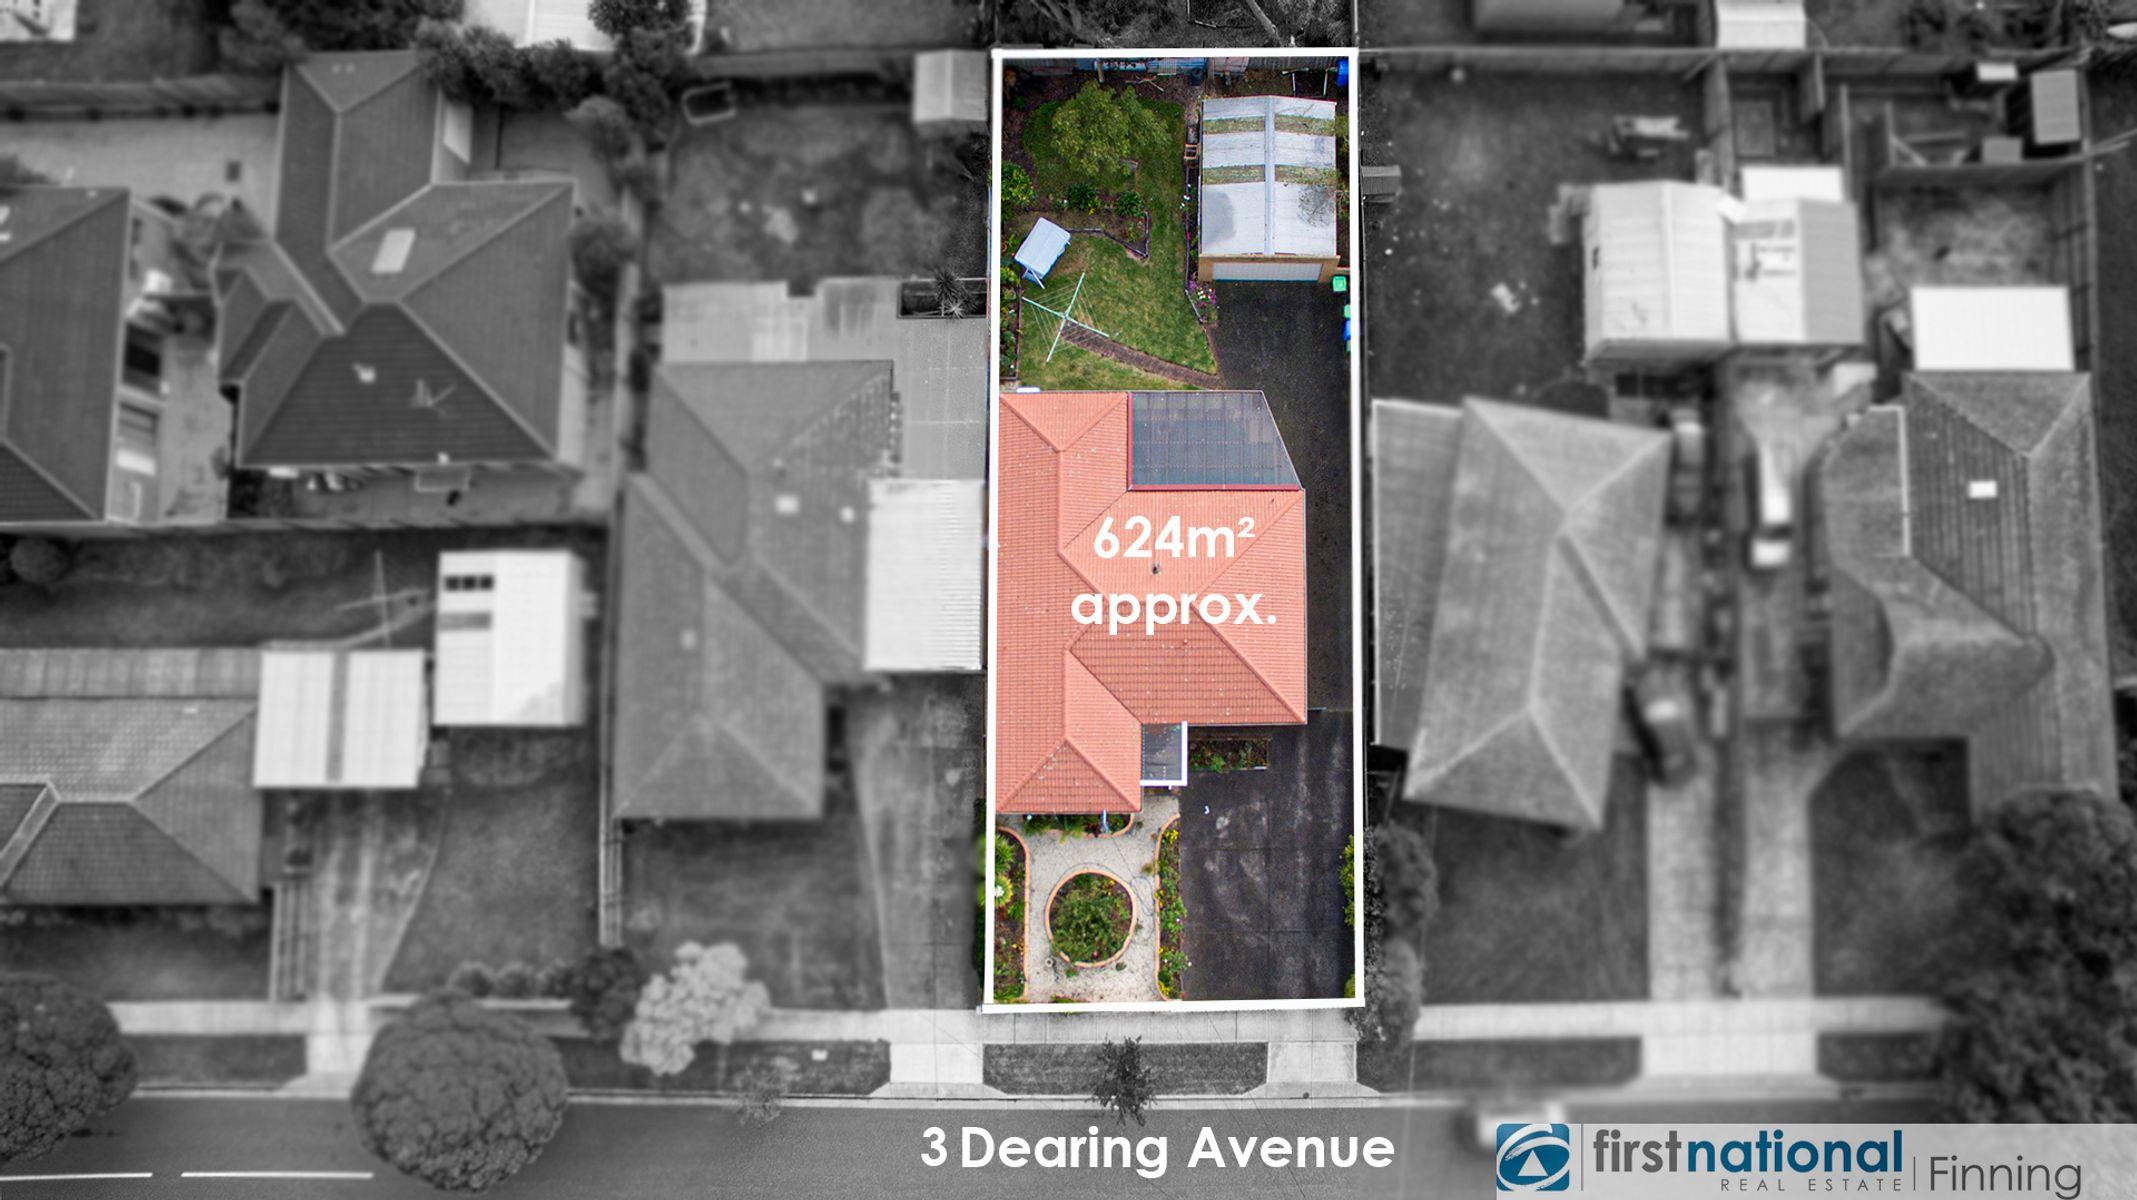 3 Dearing Avenue, Cranbourne, VIC 3977